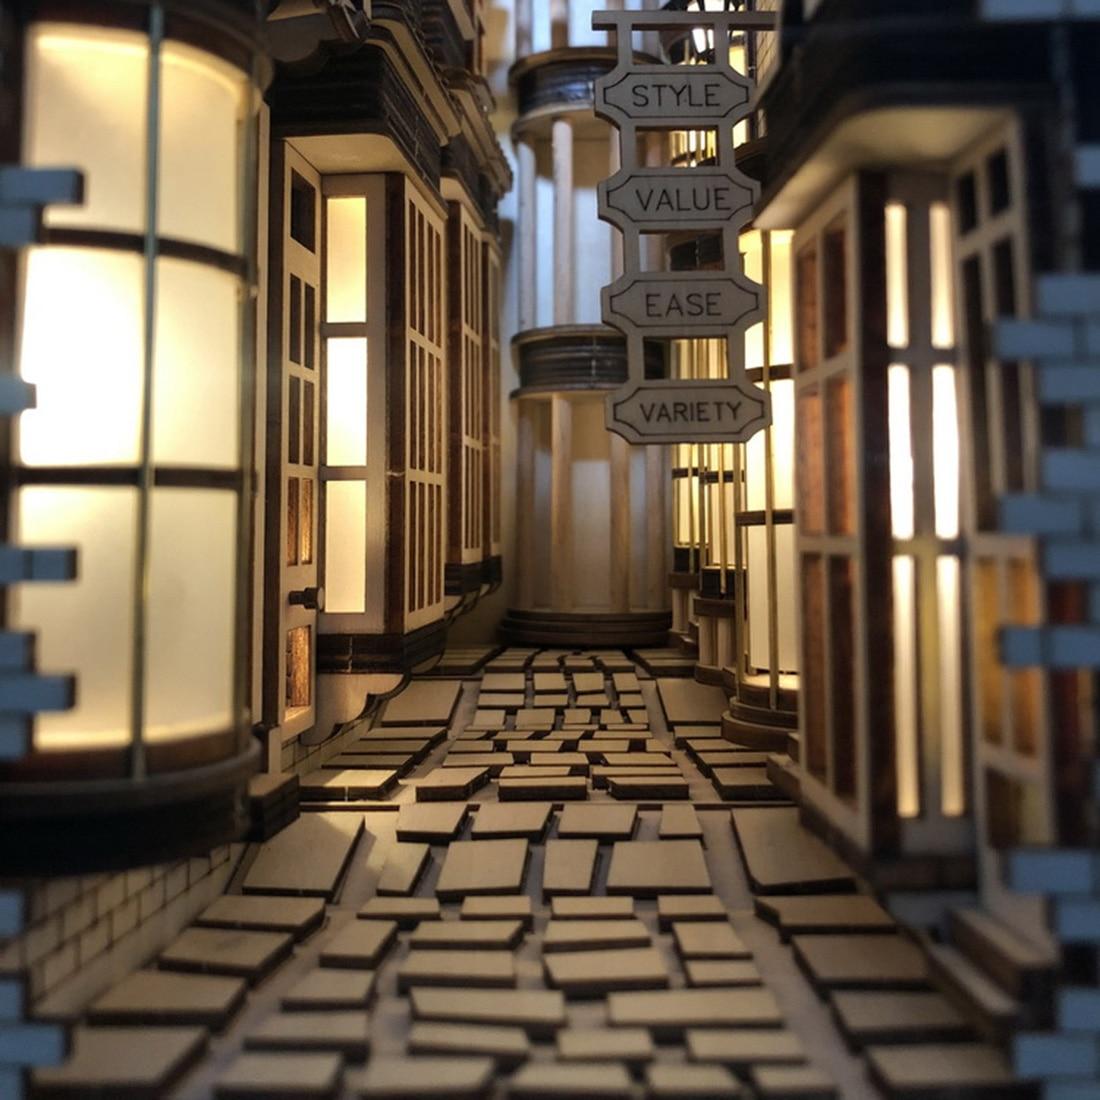 H22559c1503284956ba86e2457514b091N - Robotime - DIY Models, DIY Miniature Houses, 3d Wooden Puzzle